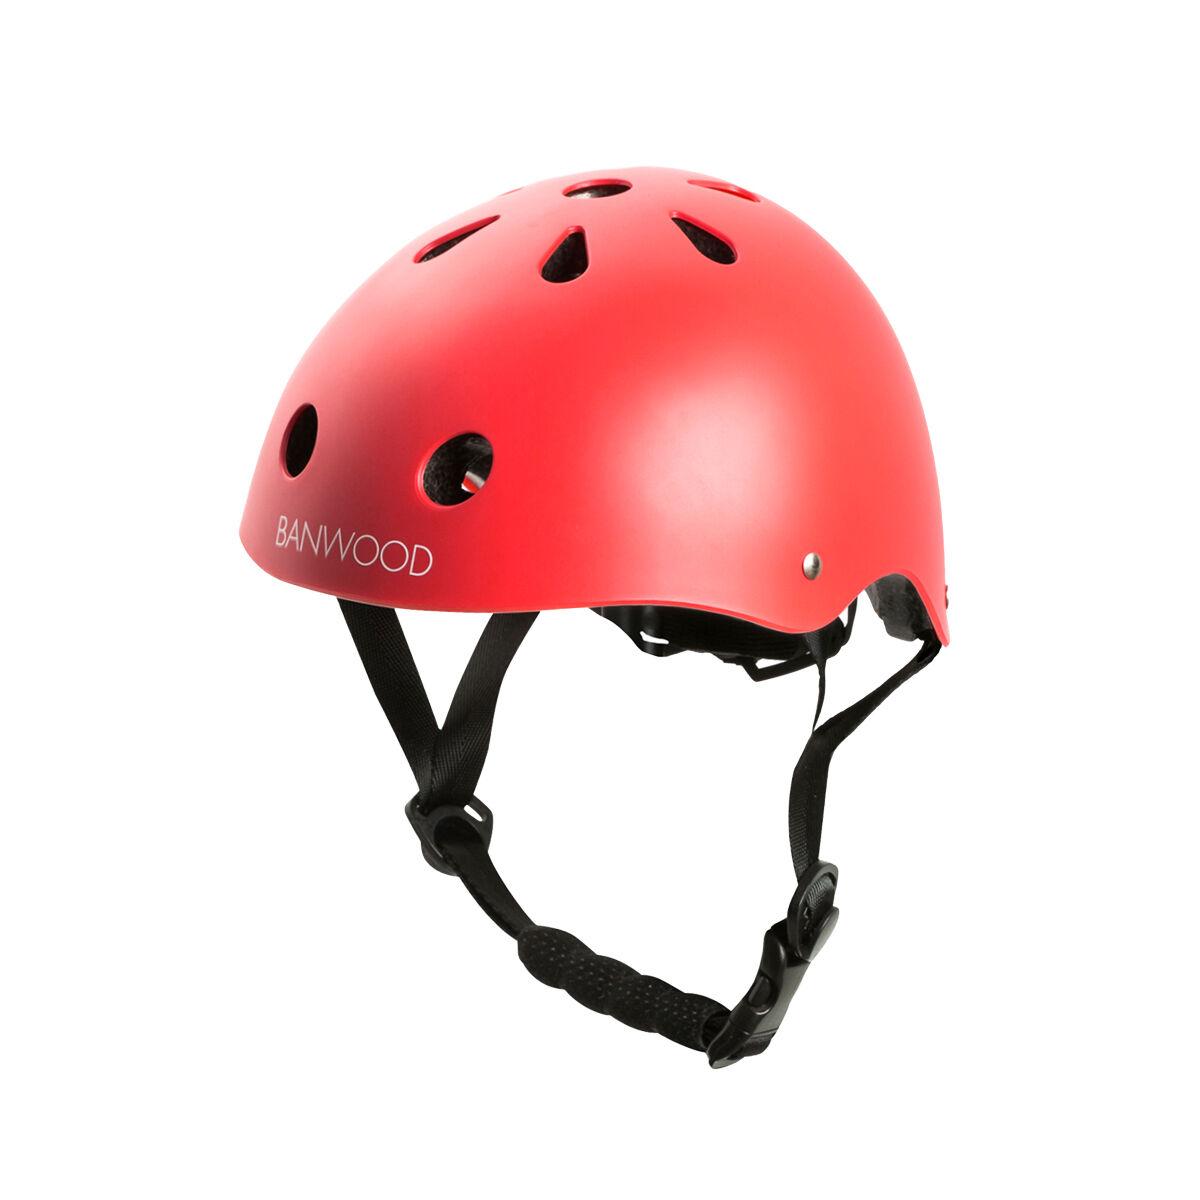 Banwood Bikes Classic Helmet (Color: Red)